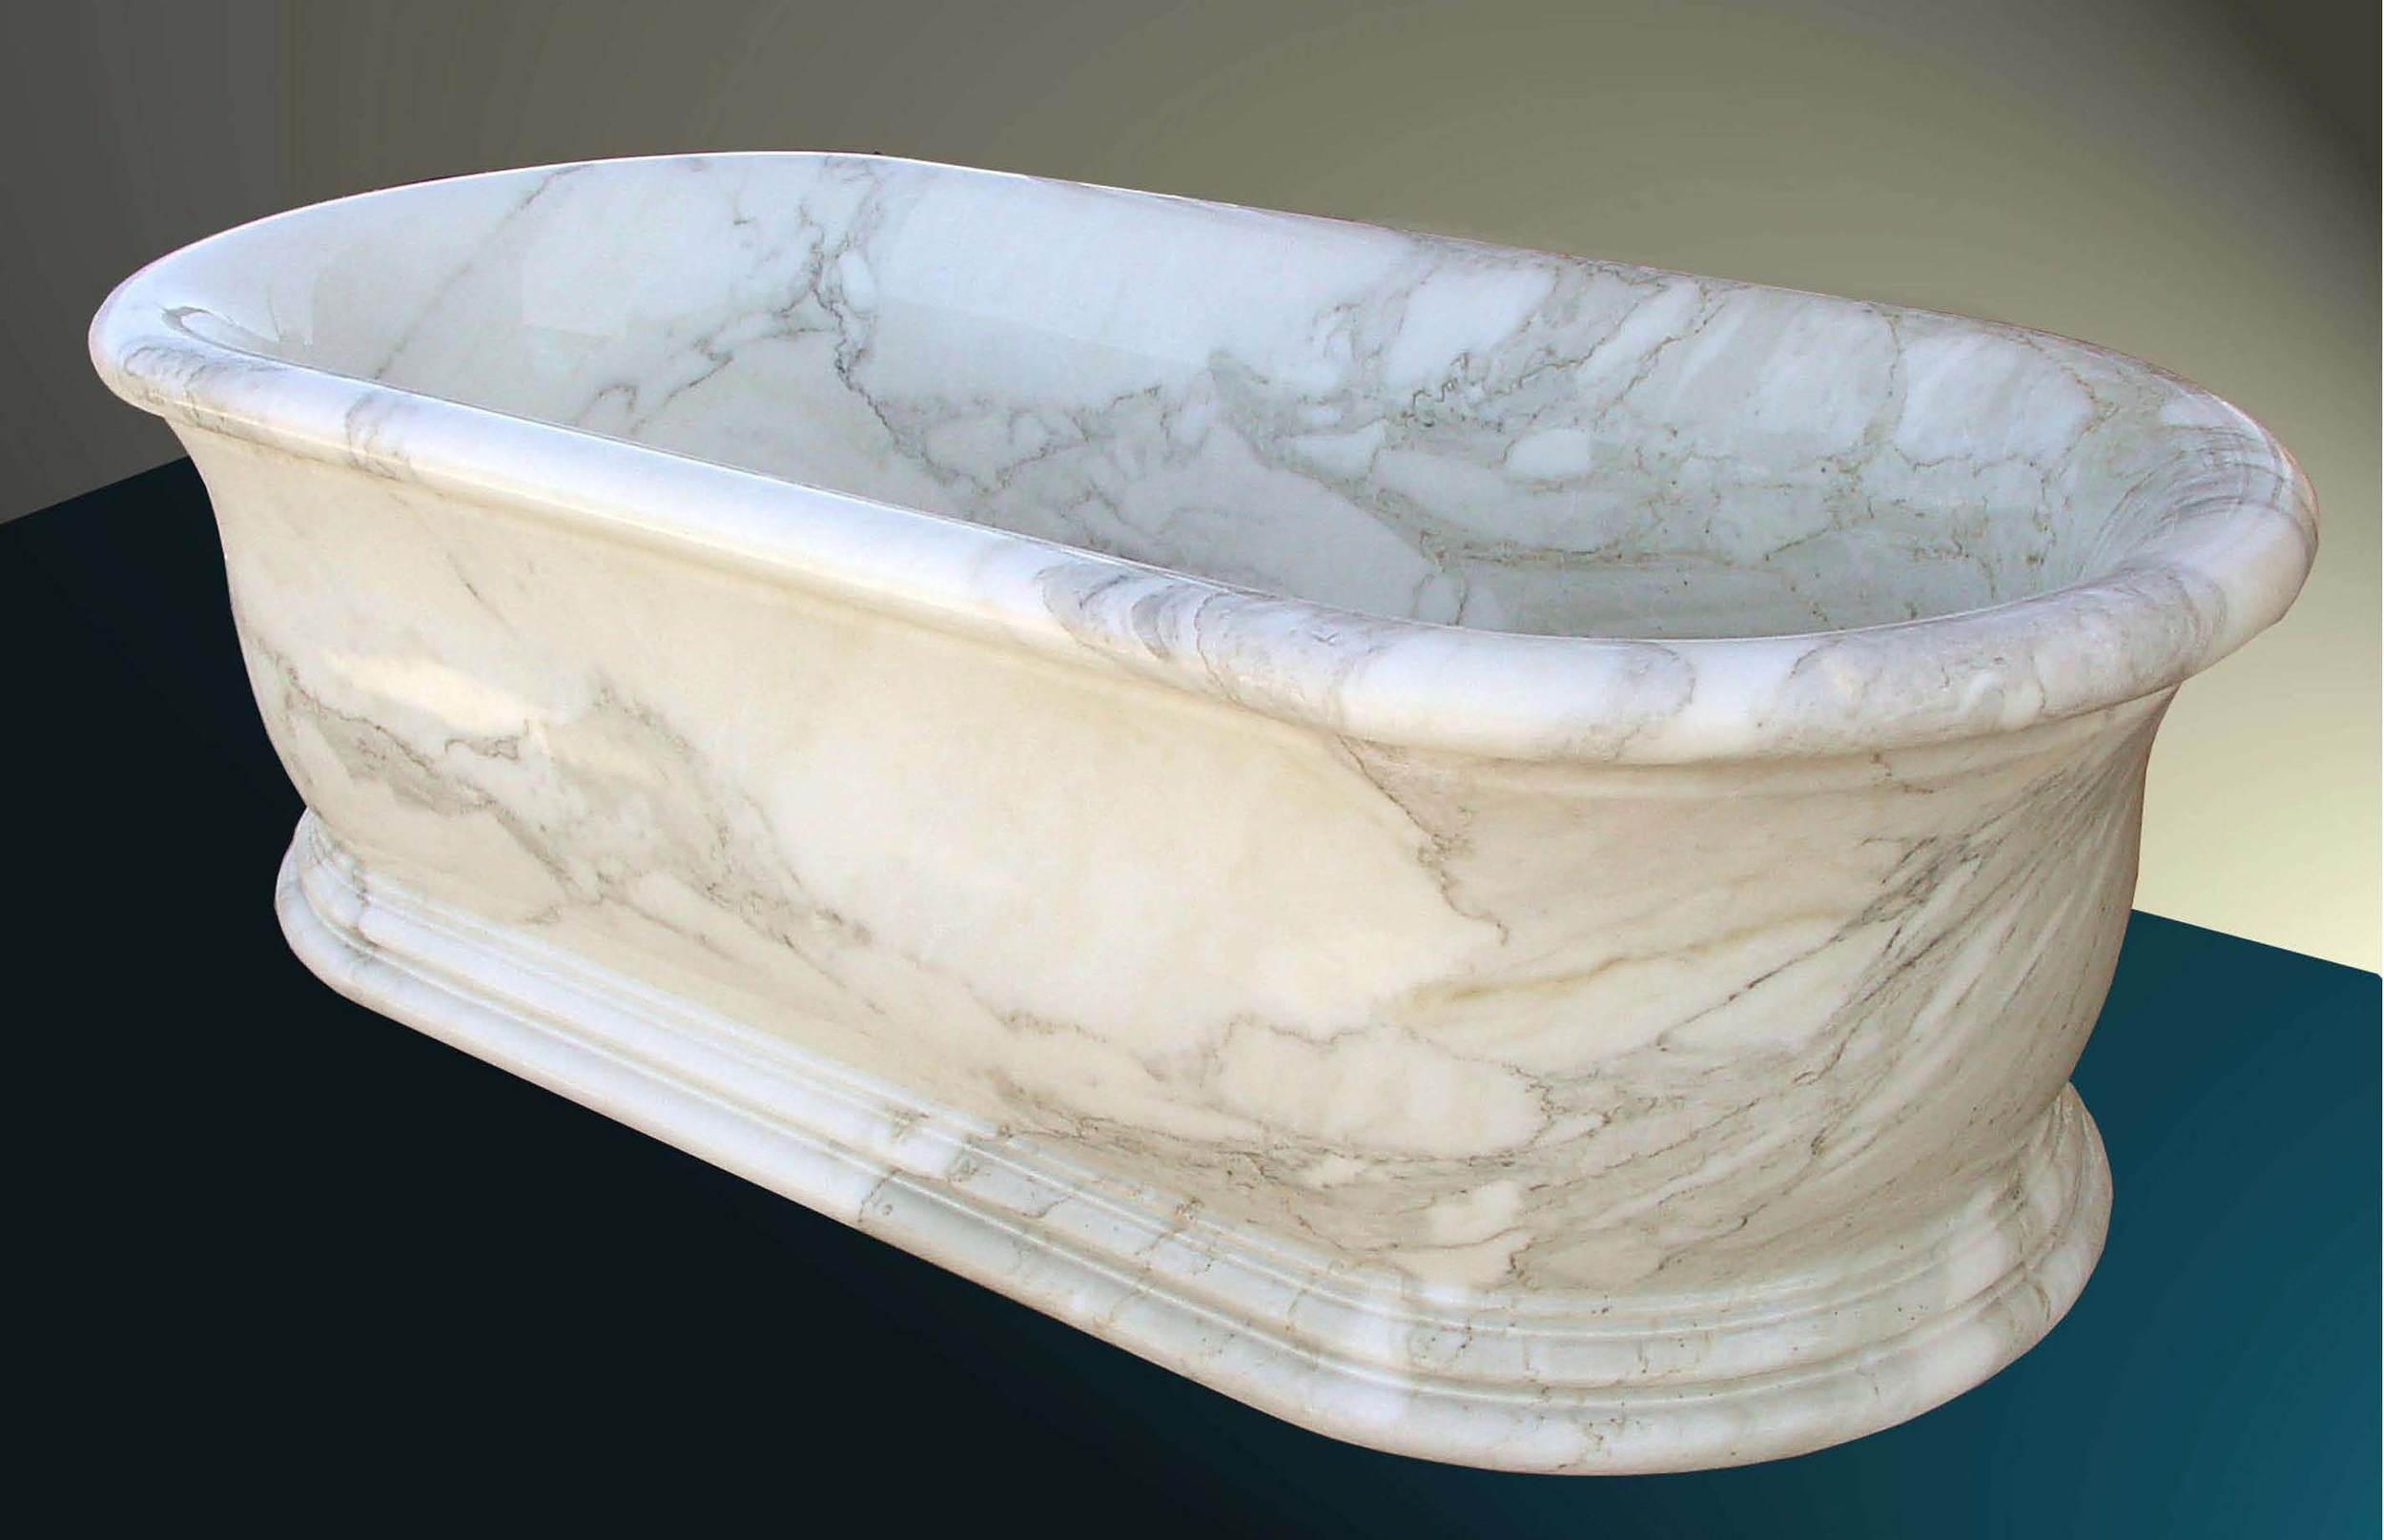 Bathtub in Calacatta D'Oro marble